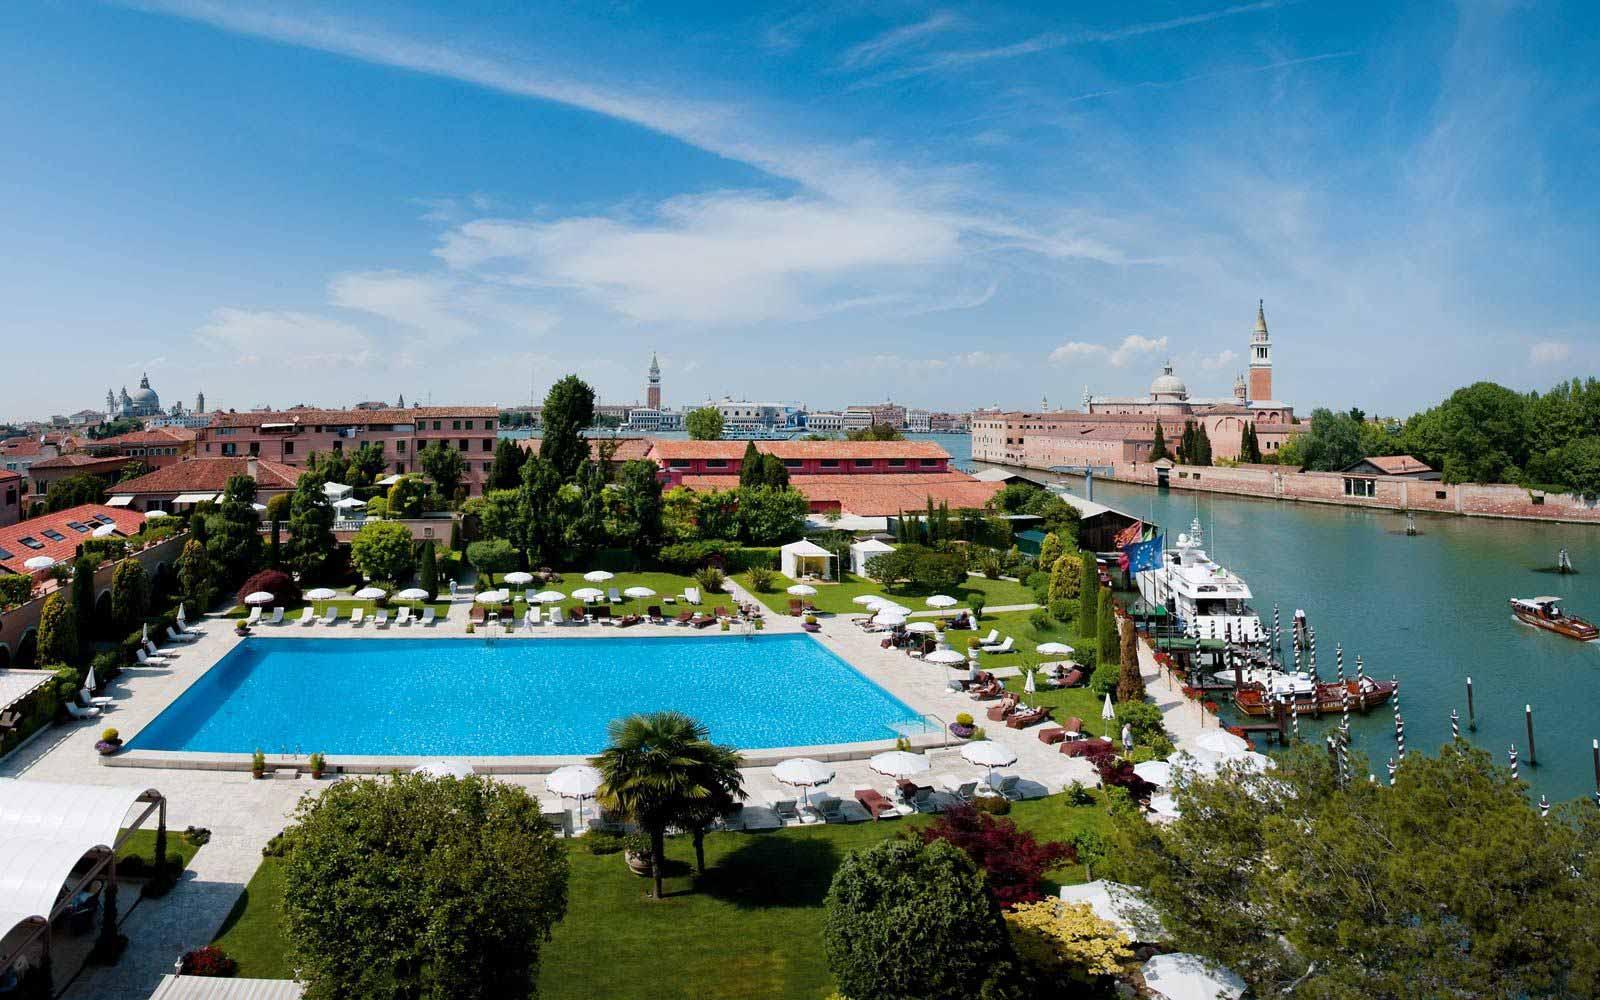 Pool at Belmond Hotel Cipriani